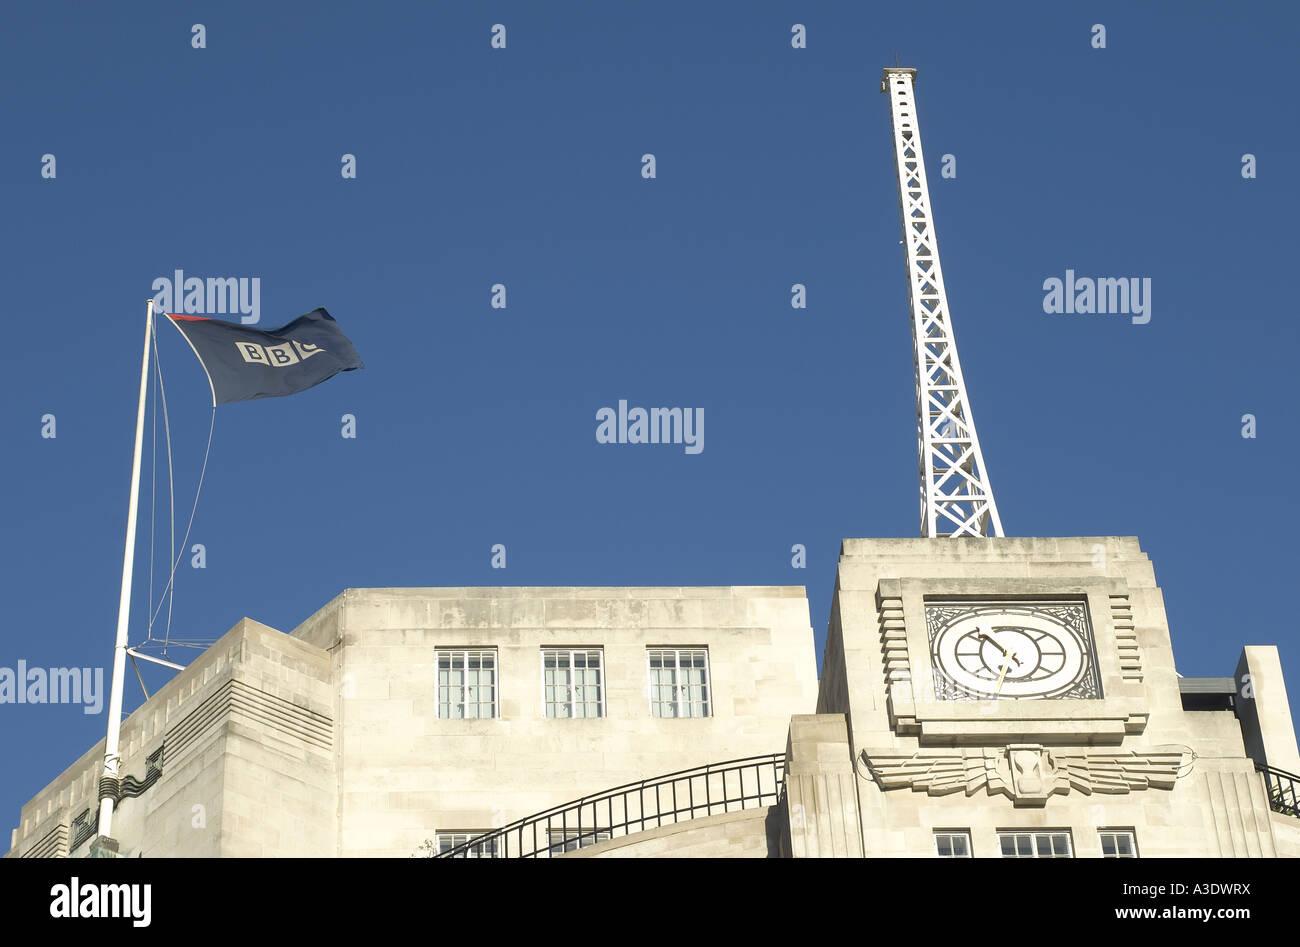 Broadcasting House BBC Corporate Headquarters London - Stock Image